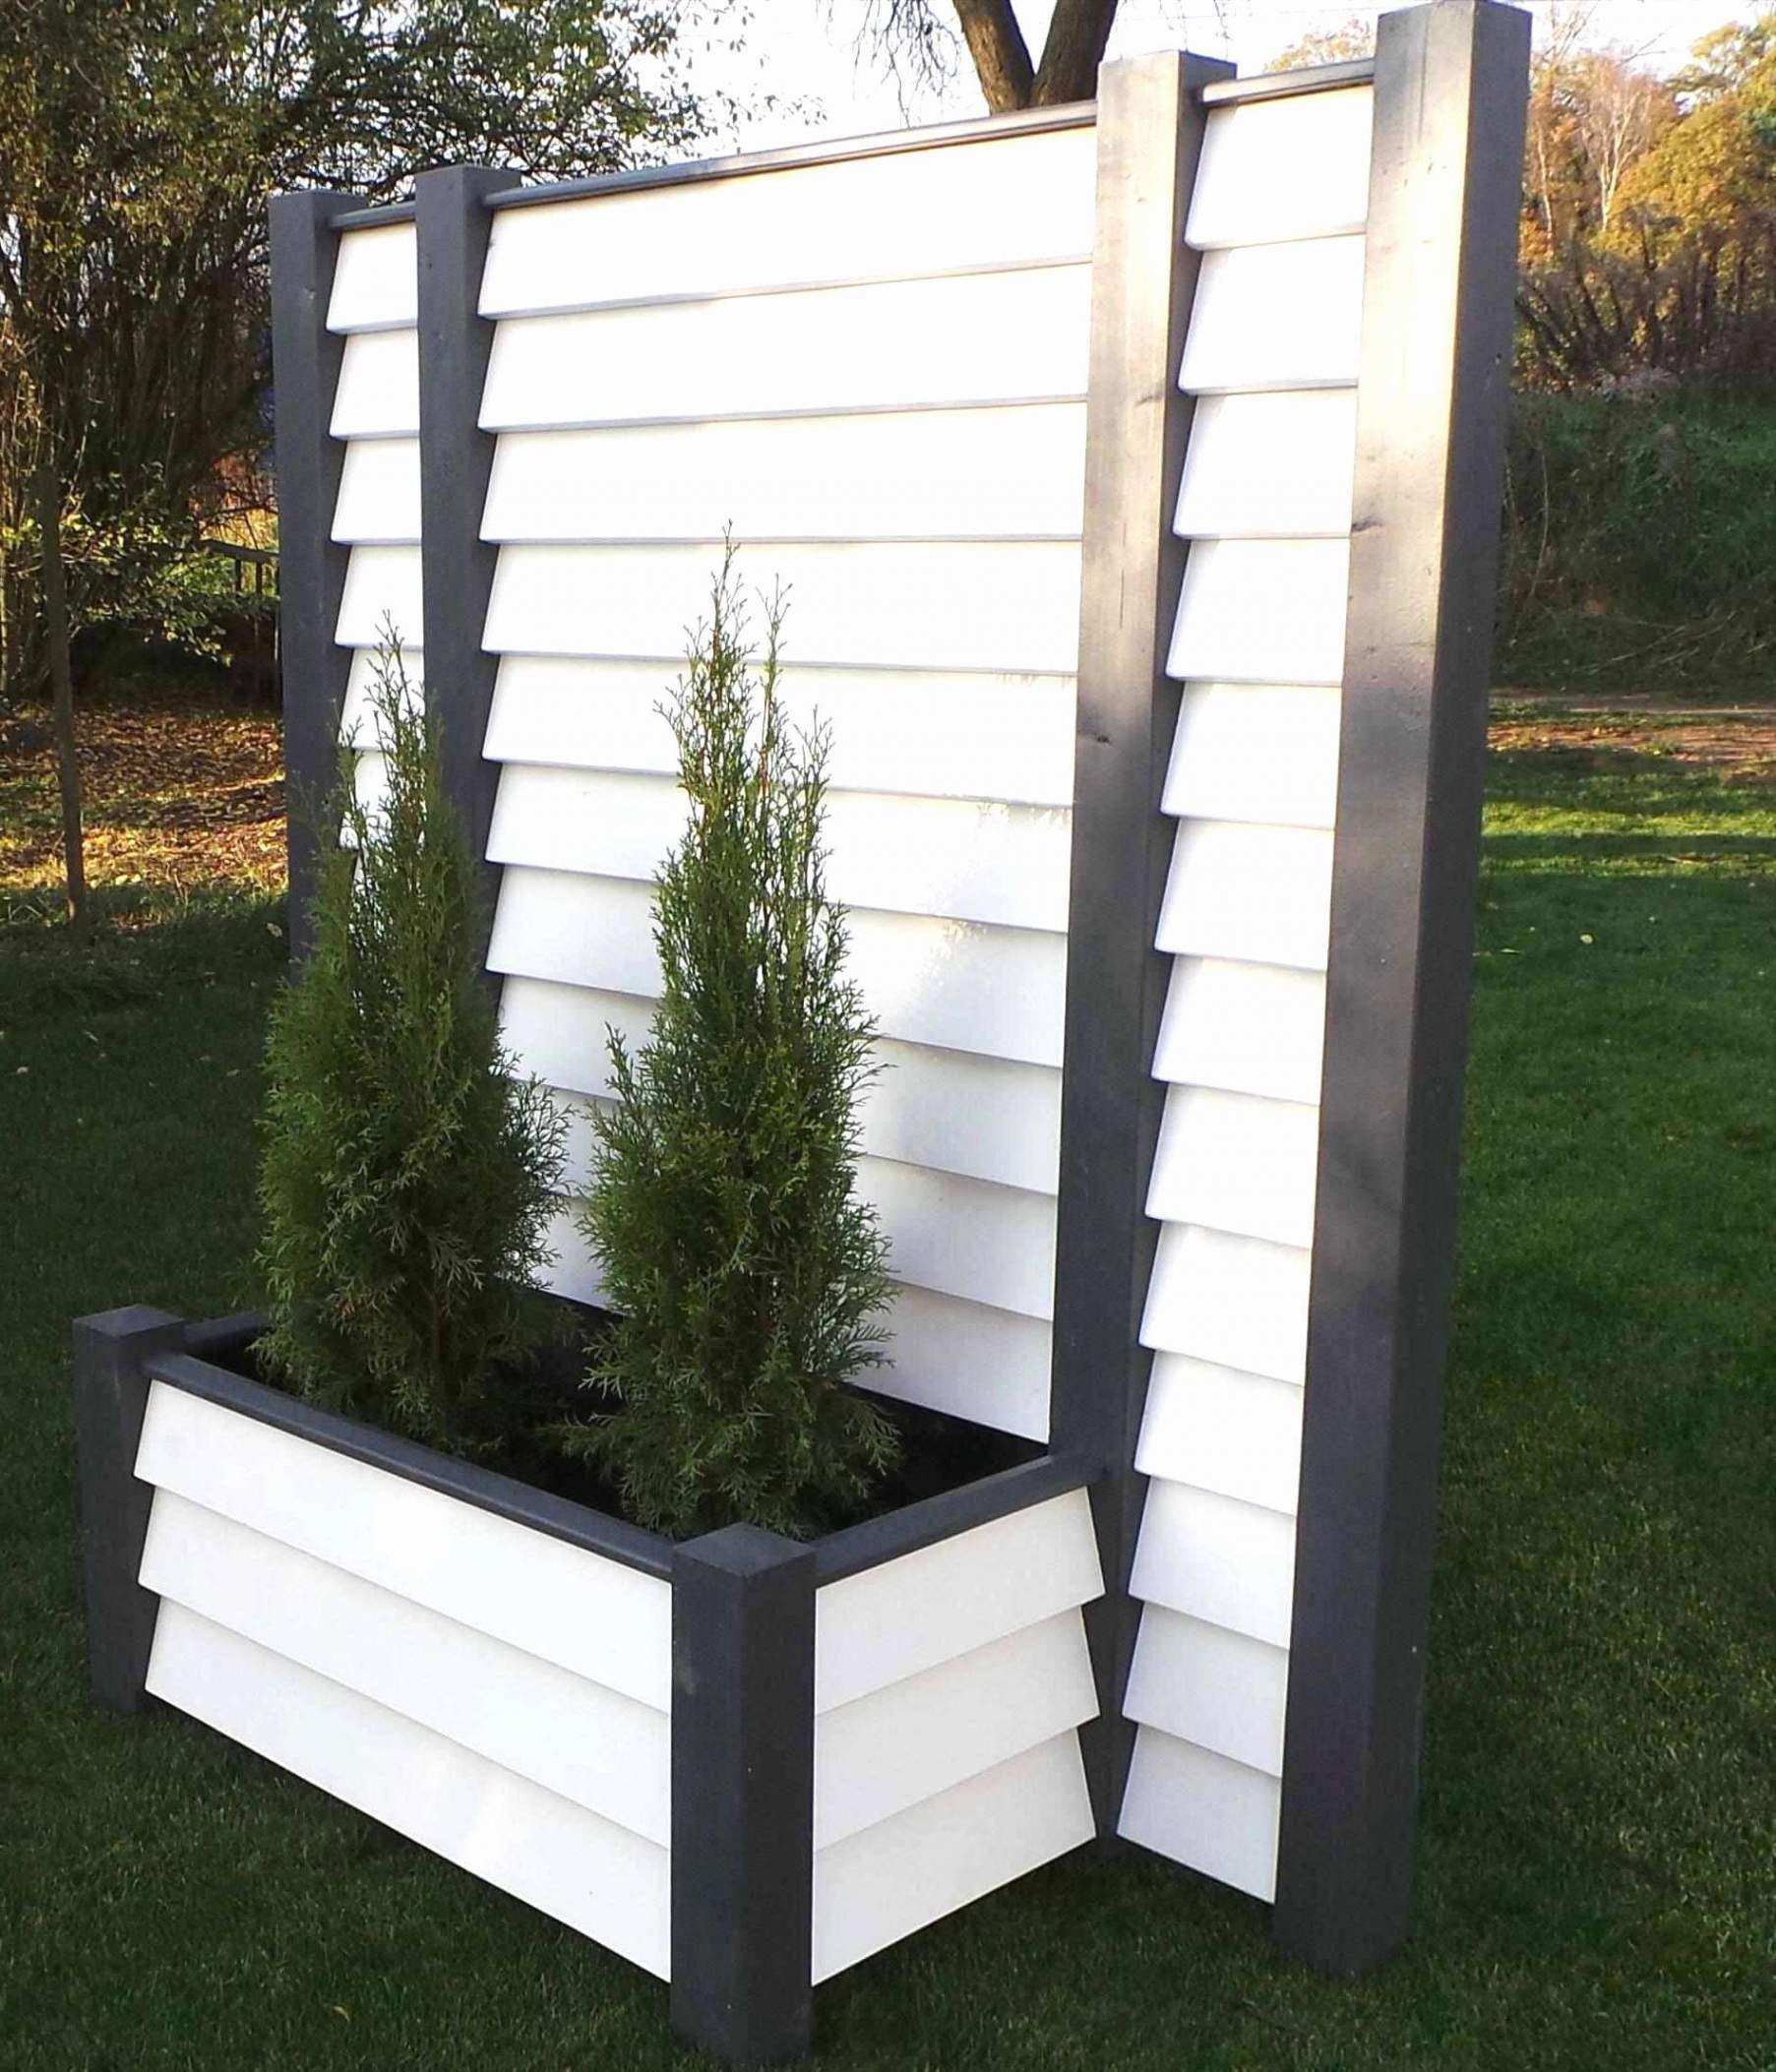 46 kollektion terrassenuberdachung mit lamellen stock mobel aus osb platten mobel aus osb platten